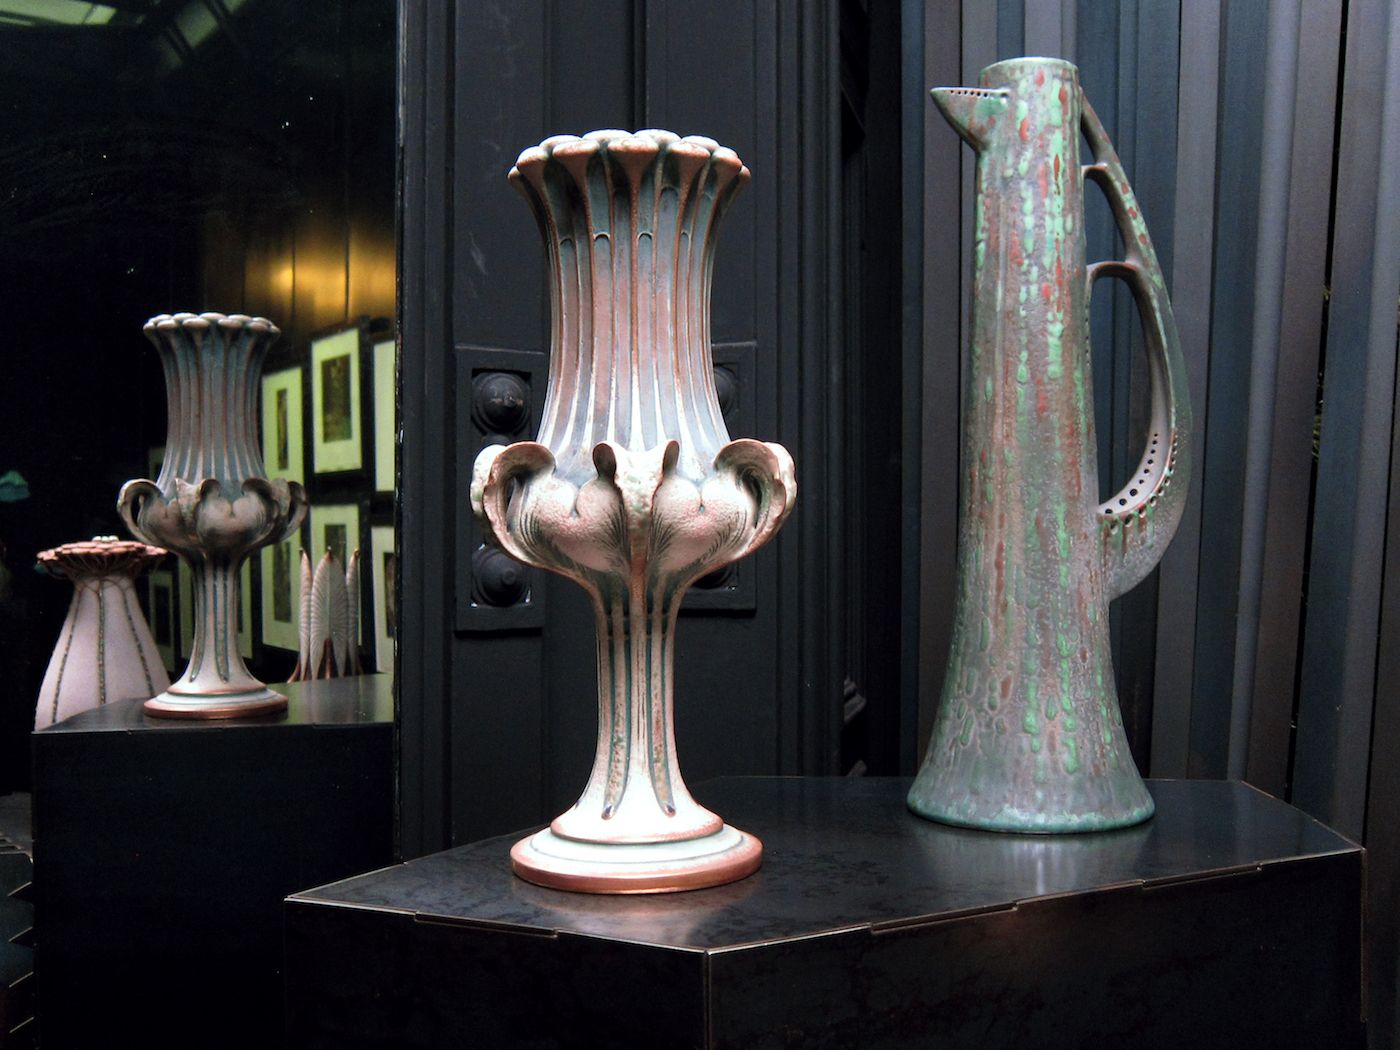 Fin-de-Siècle Austrian Pottery Paired with Prints by Klimt